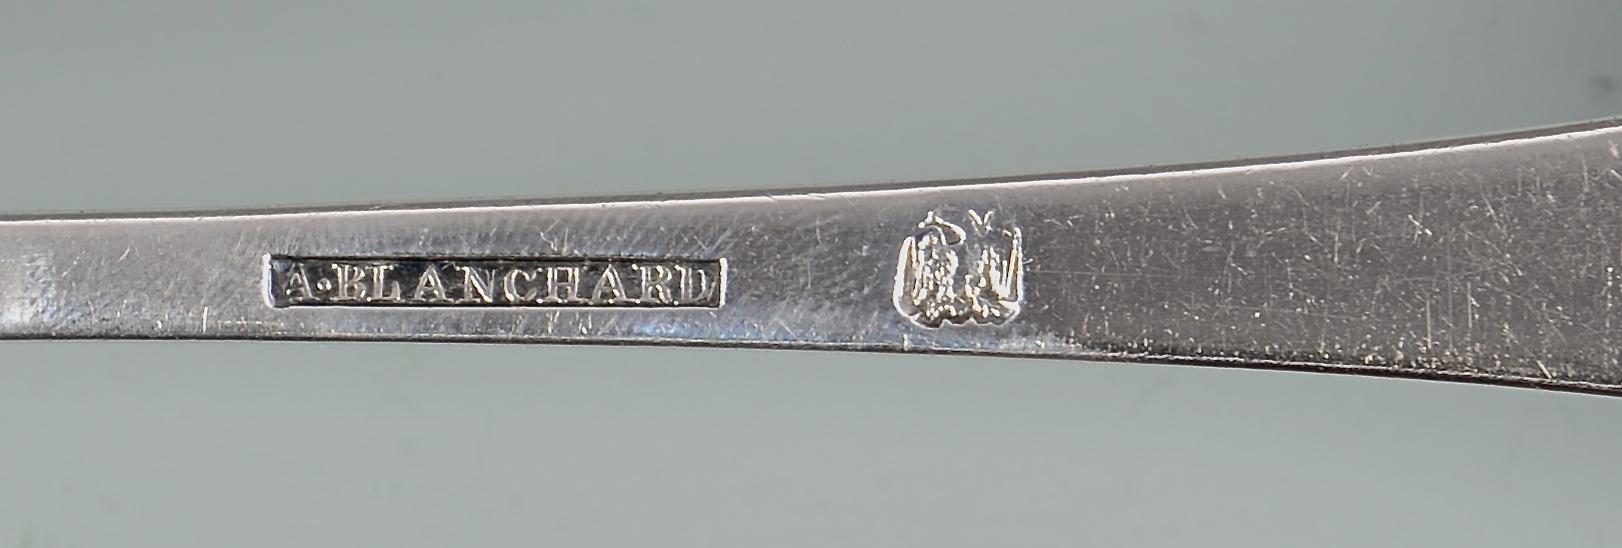 Lot 155: Asa Blanchard Punch Ladle, Coffin Handle